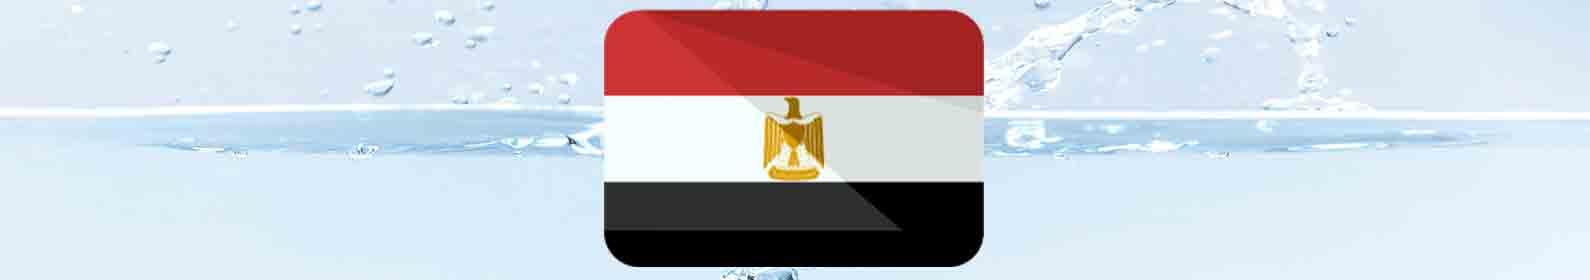 water-treatment-egypt.jpg